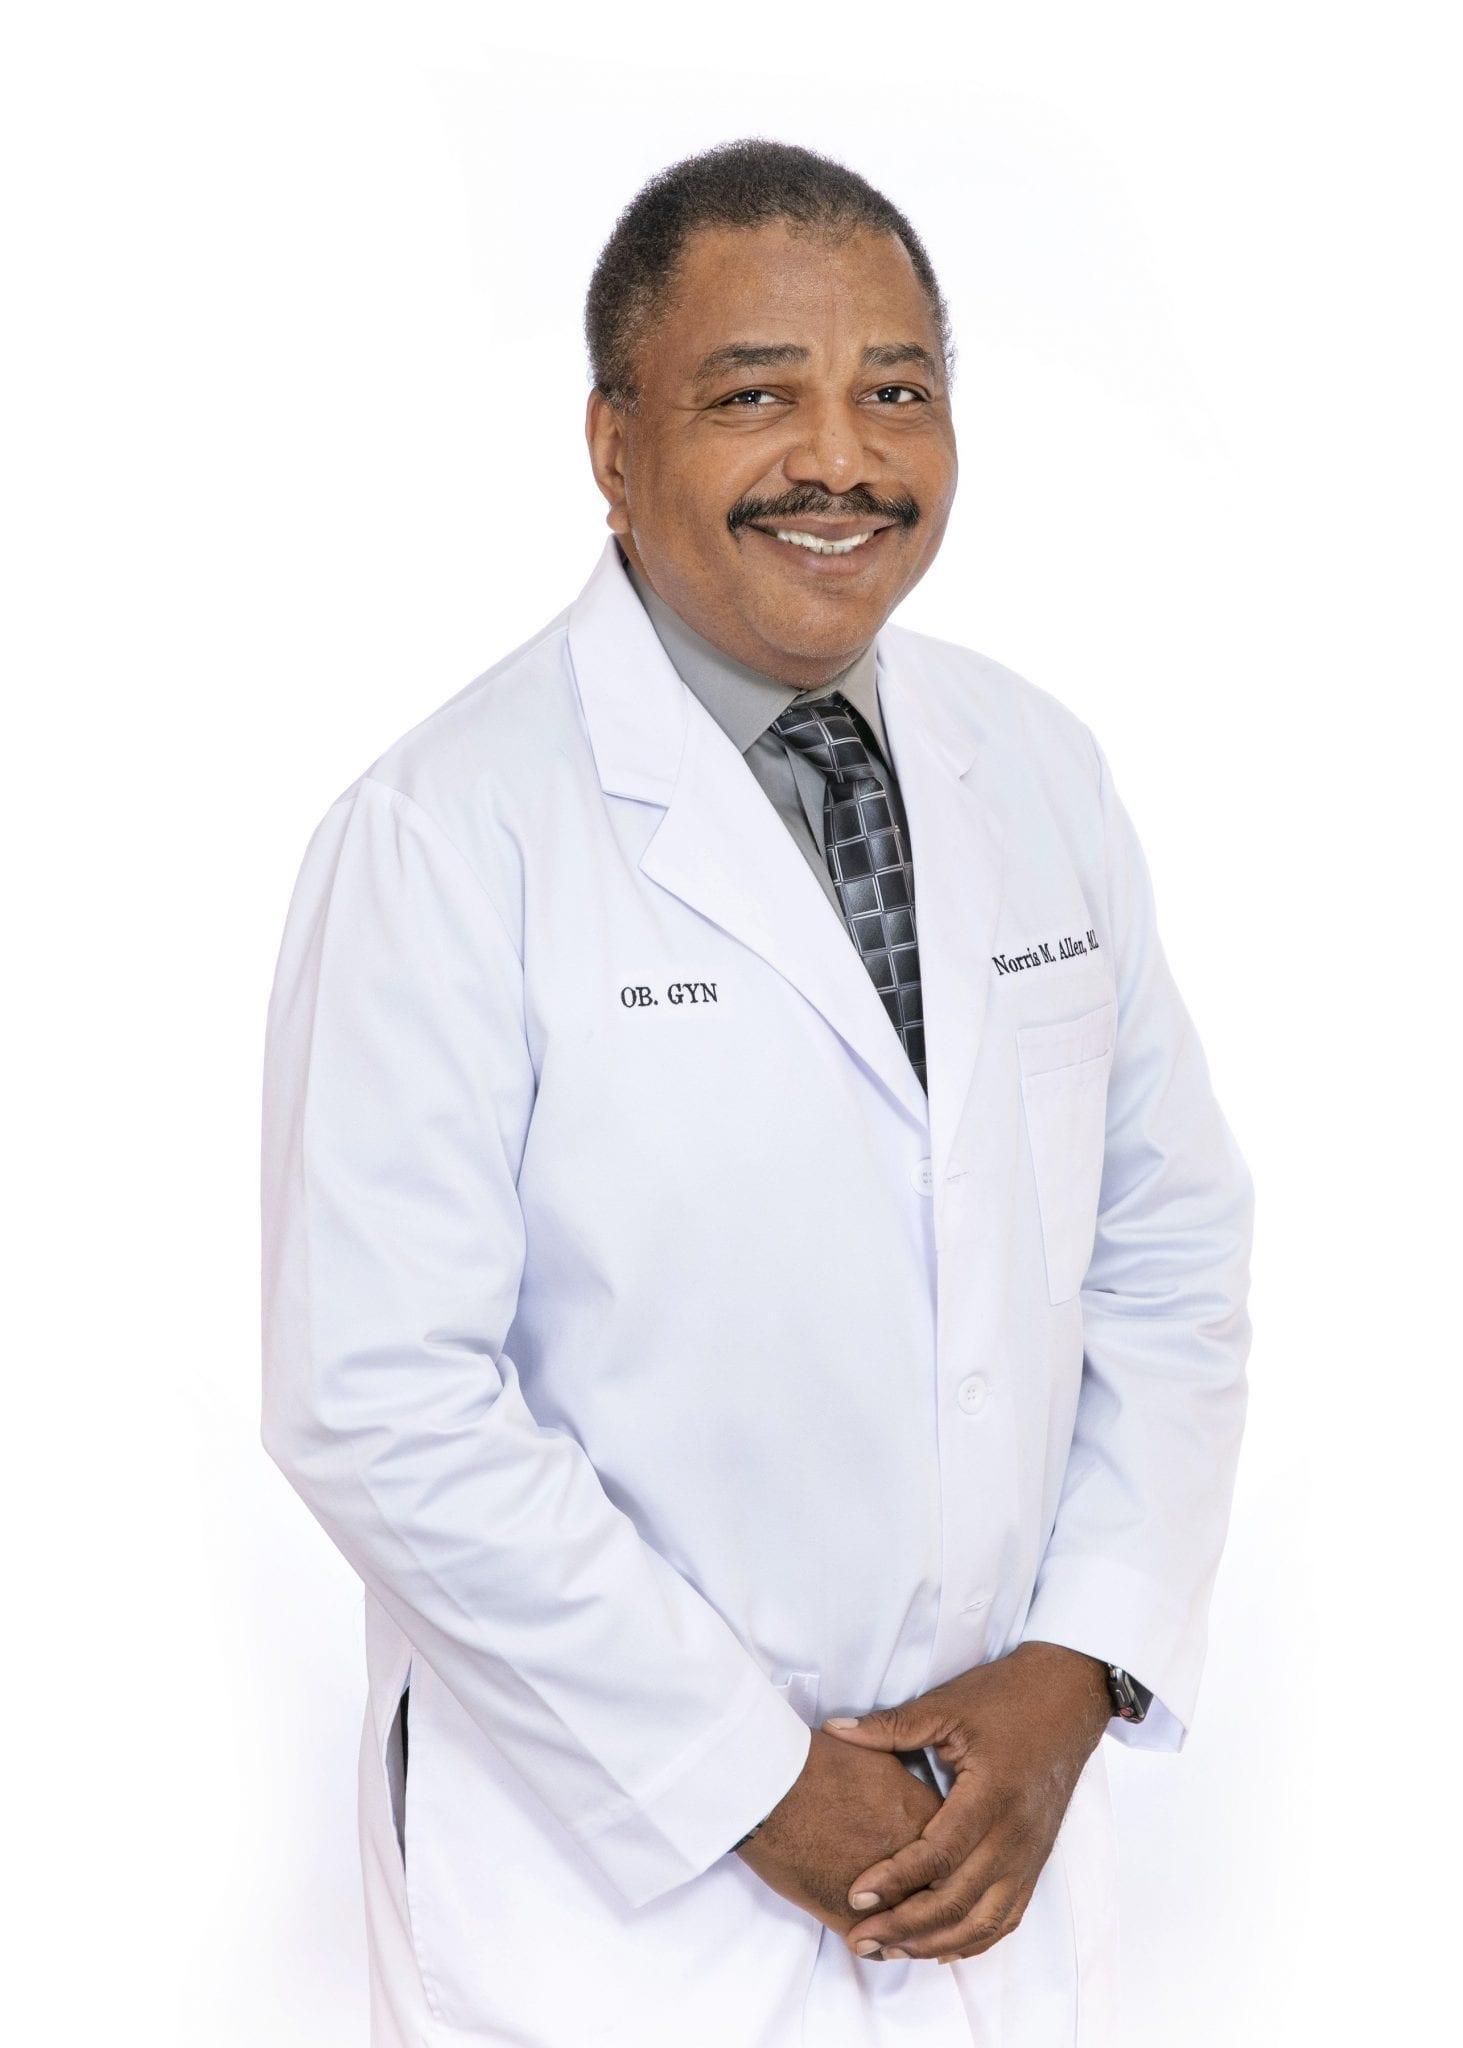 Norris M. Allen, MD, FACOG